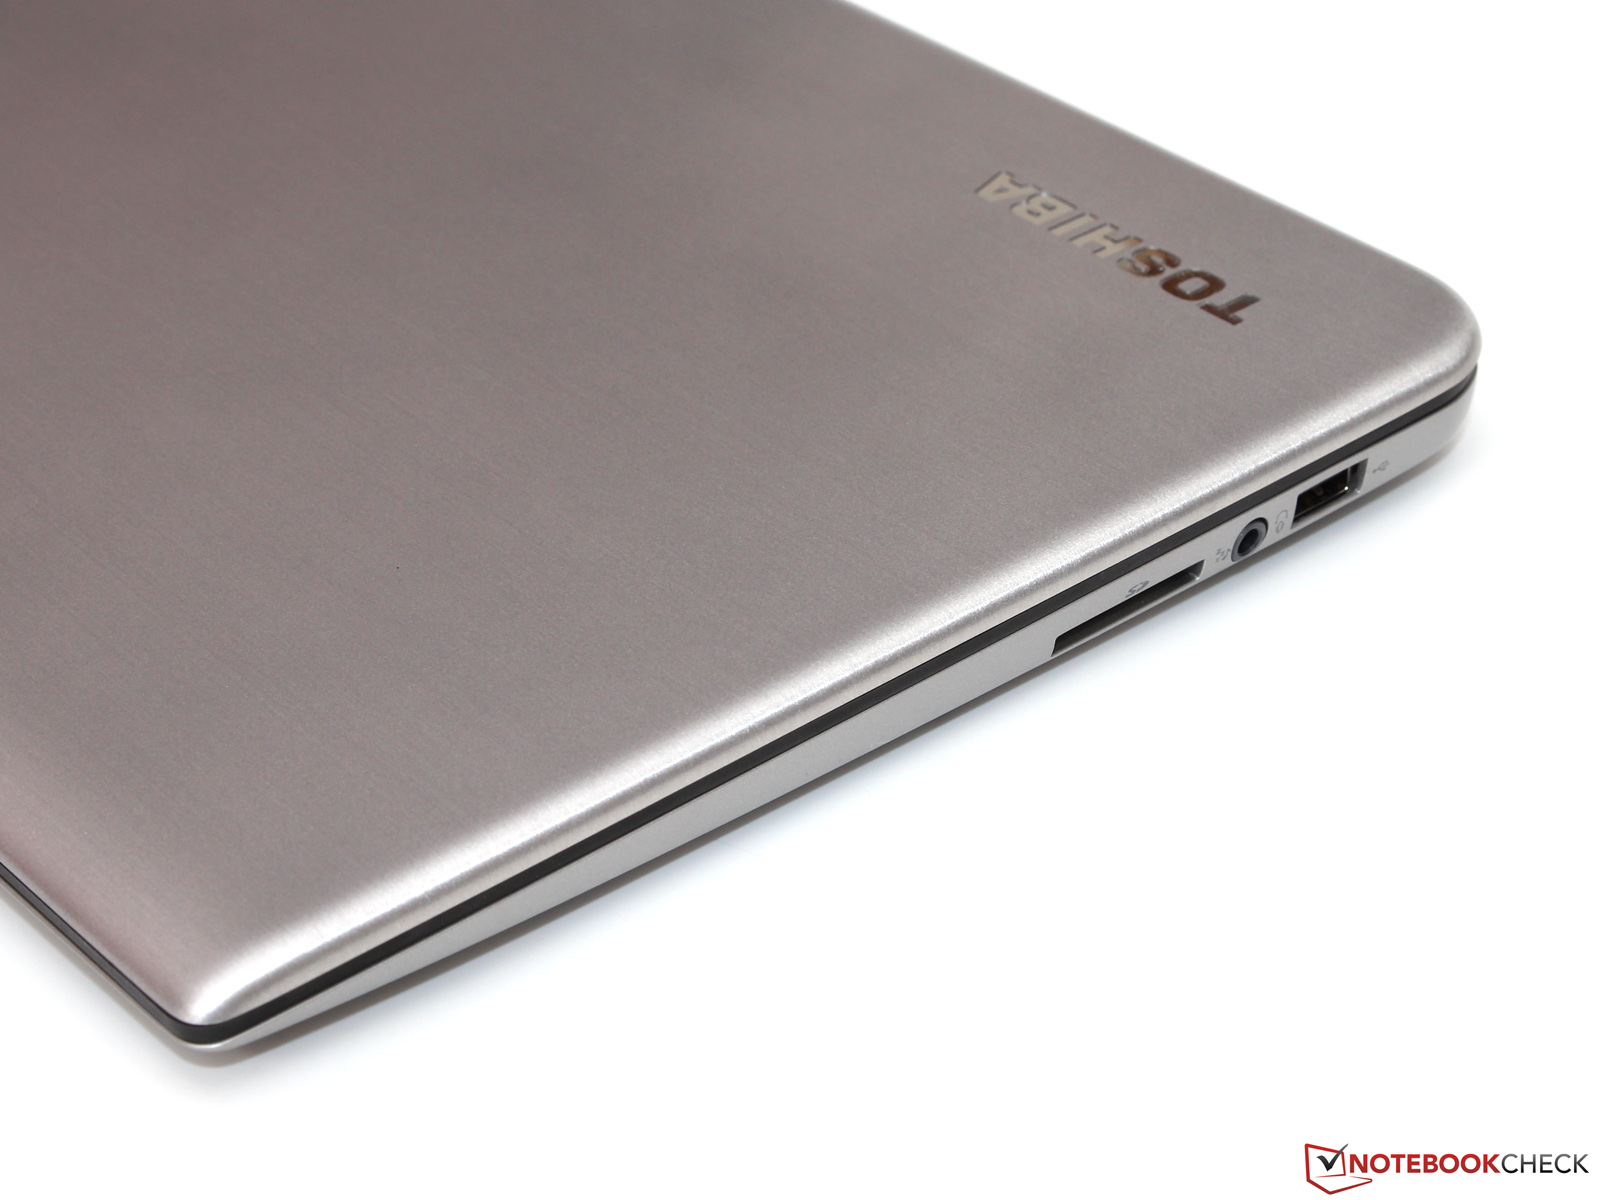 Toshiba Kirabook review: Toshiba tries to reinvent itself ...